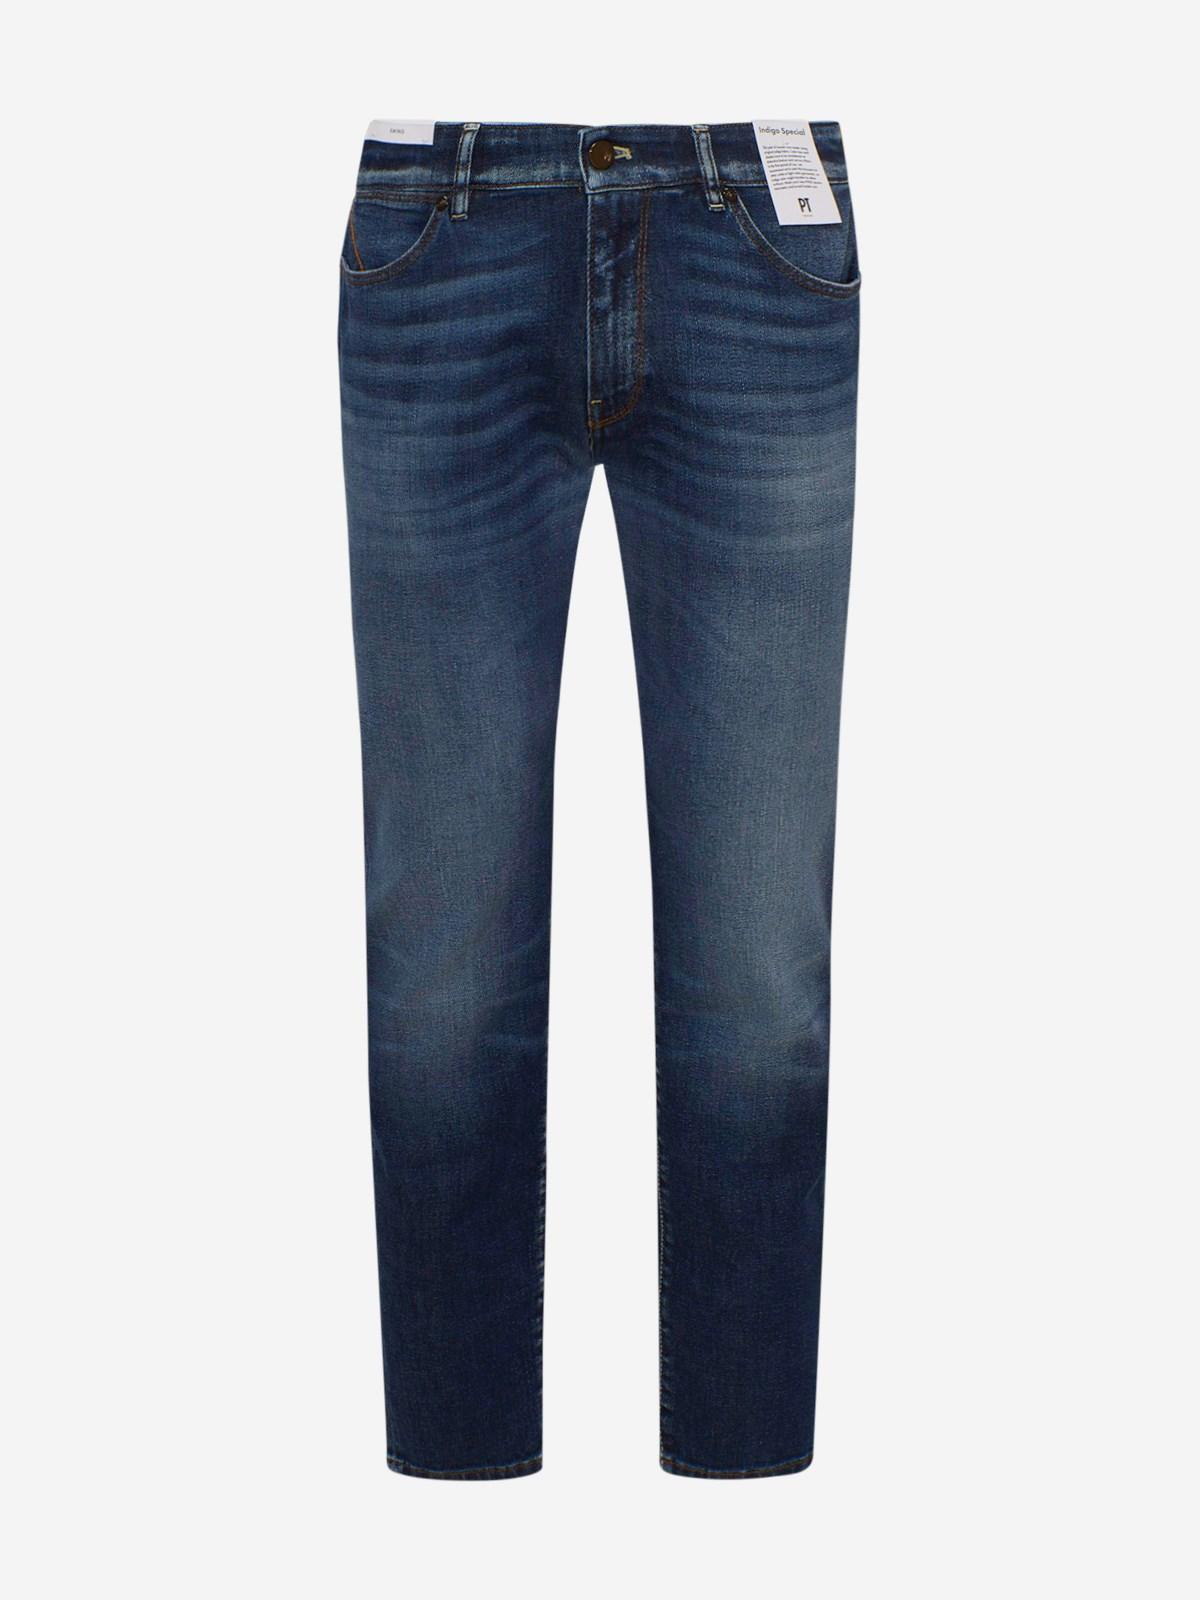 Pt05 Jeans BLUE SUPER SLIM JEANS